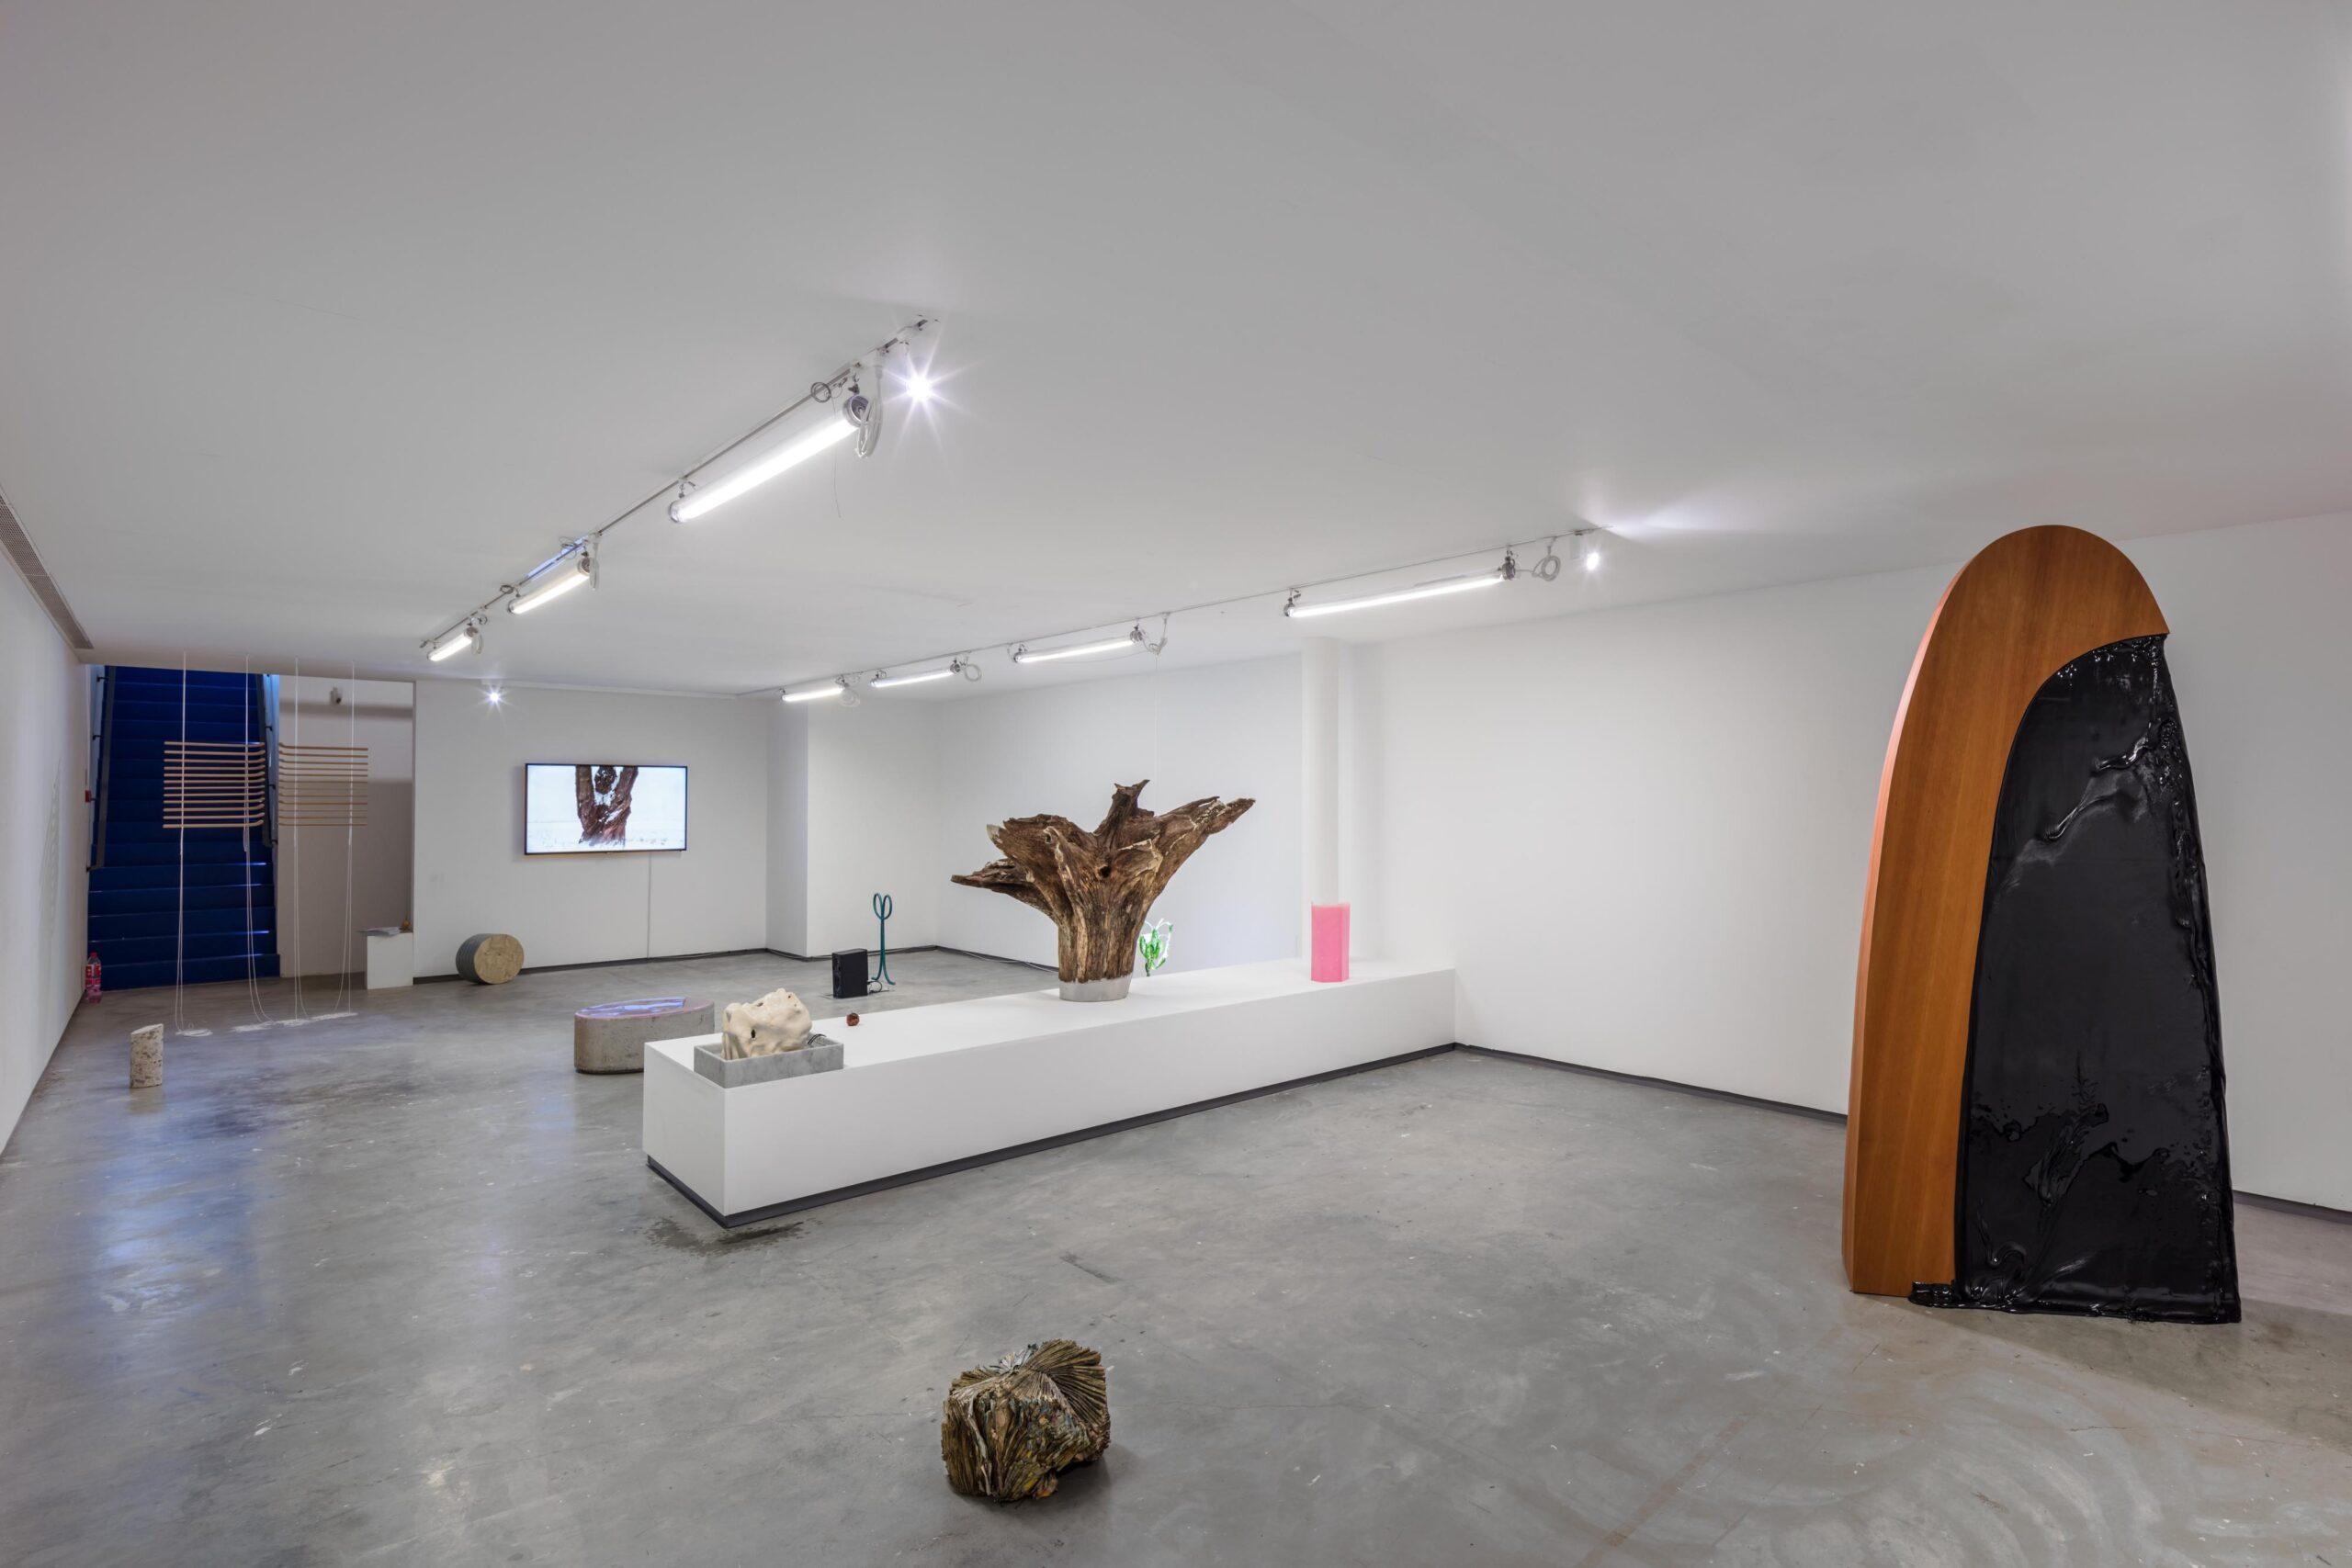 Susanna Jablonski, installationsbild. Foto: Santiago Mostyn